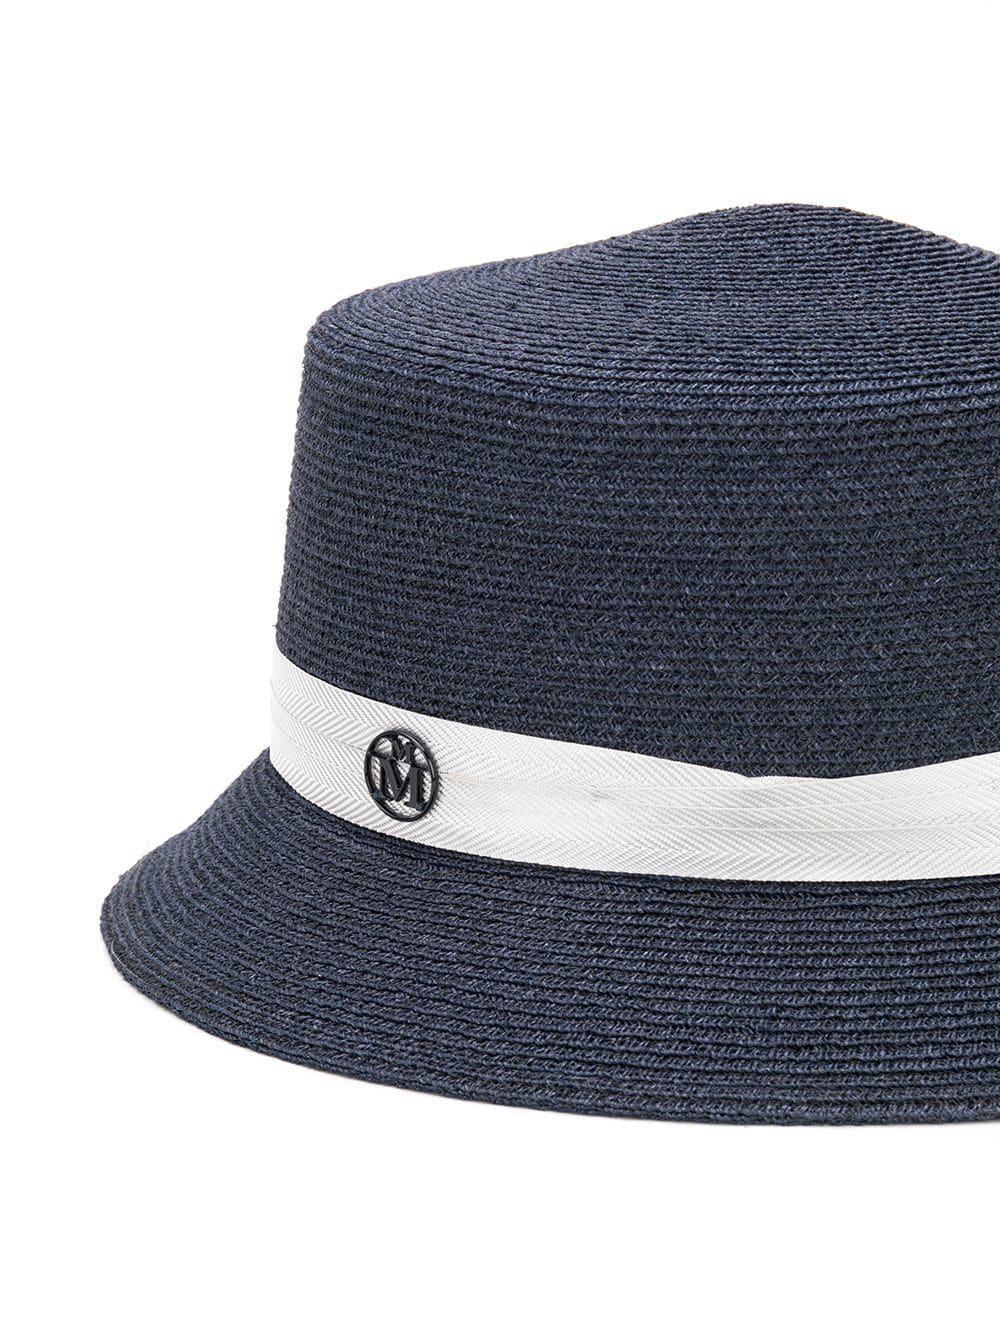 Lyst - Maison Michel Arsene Cloche Hat in Blue 790d03194cca